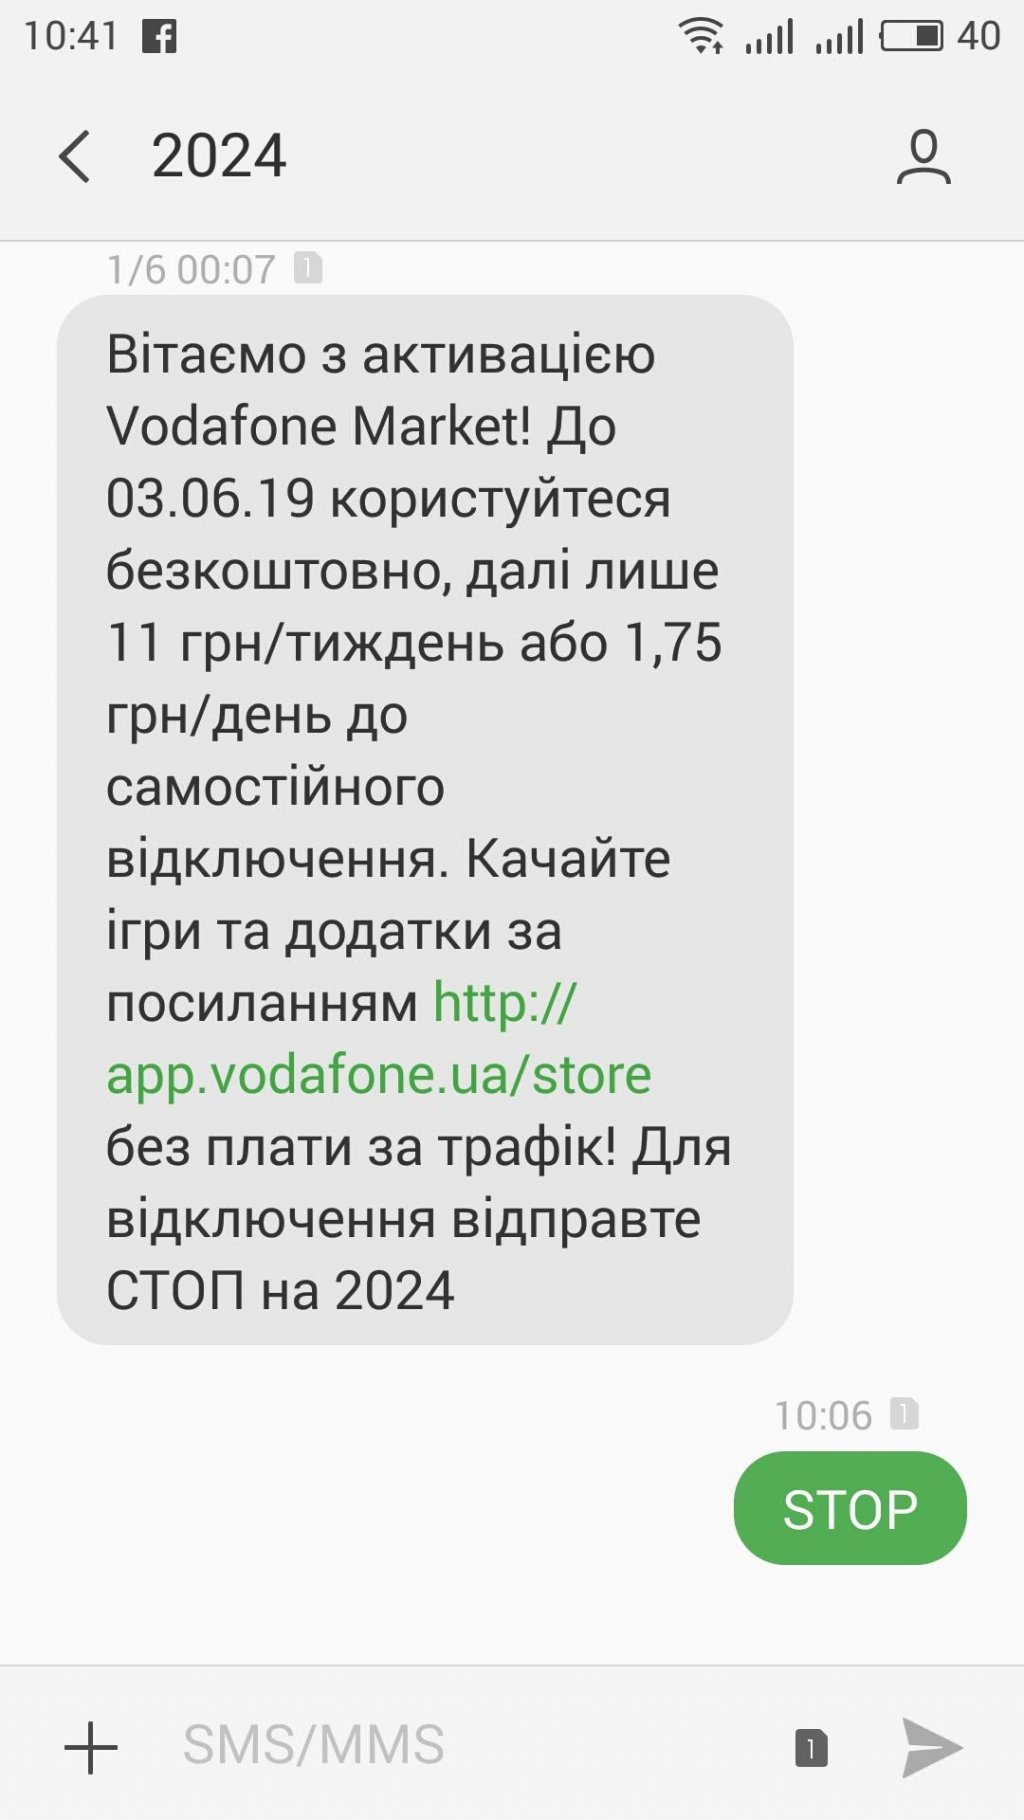 Vodafone Украина - Vodafone market услуга 2024